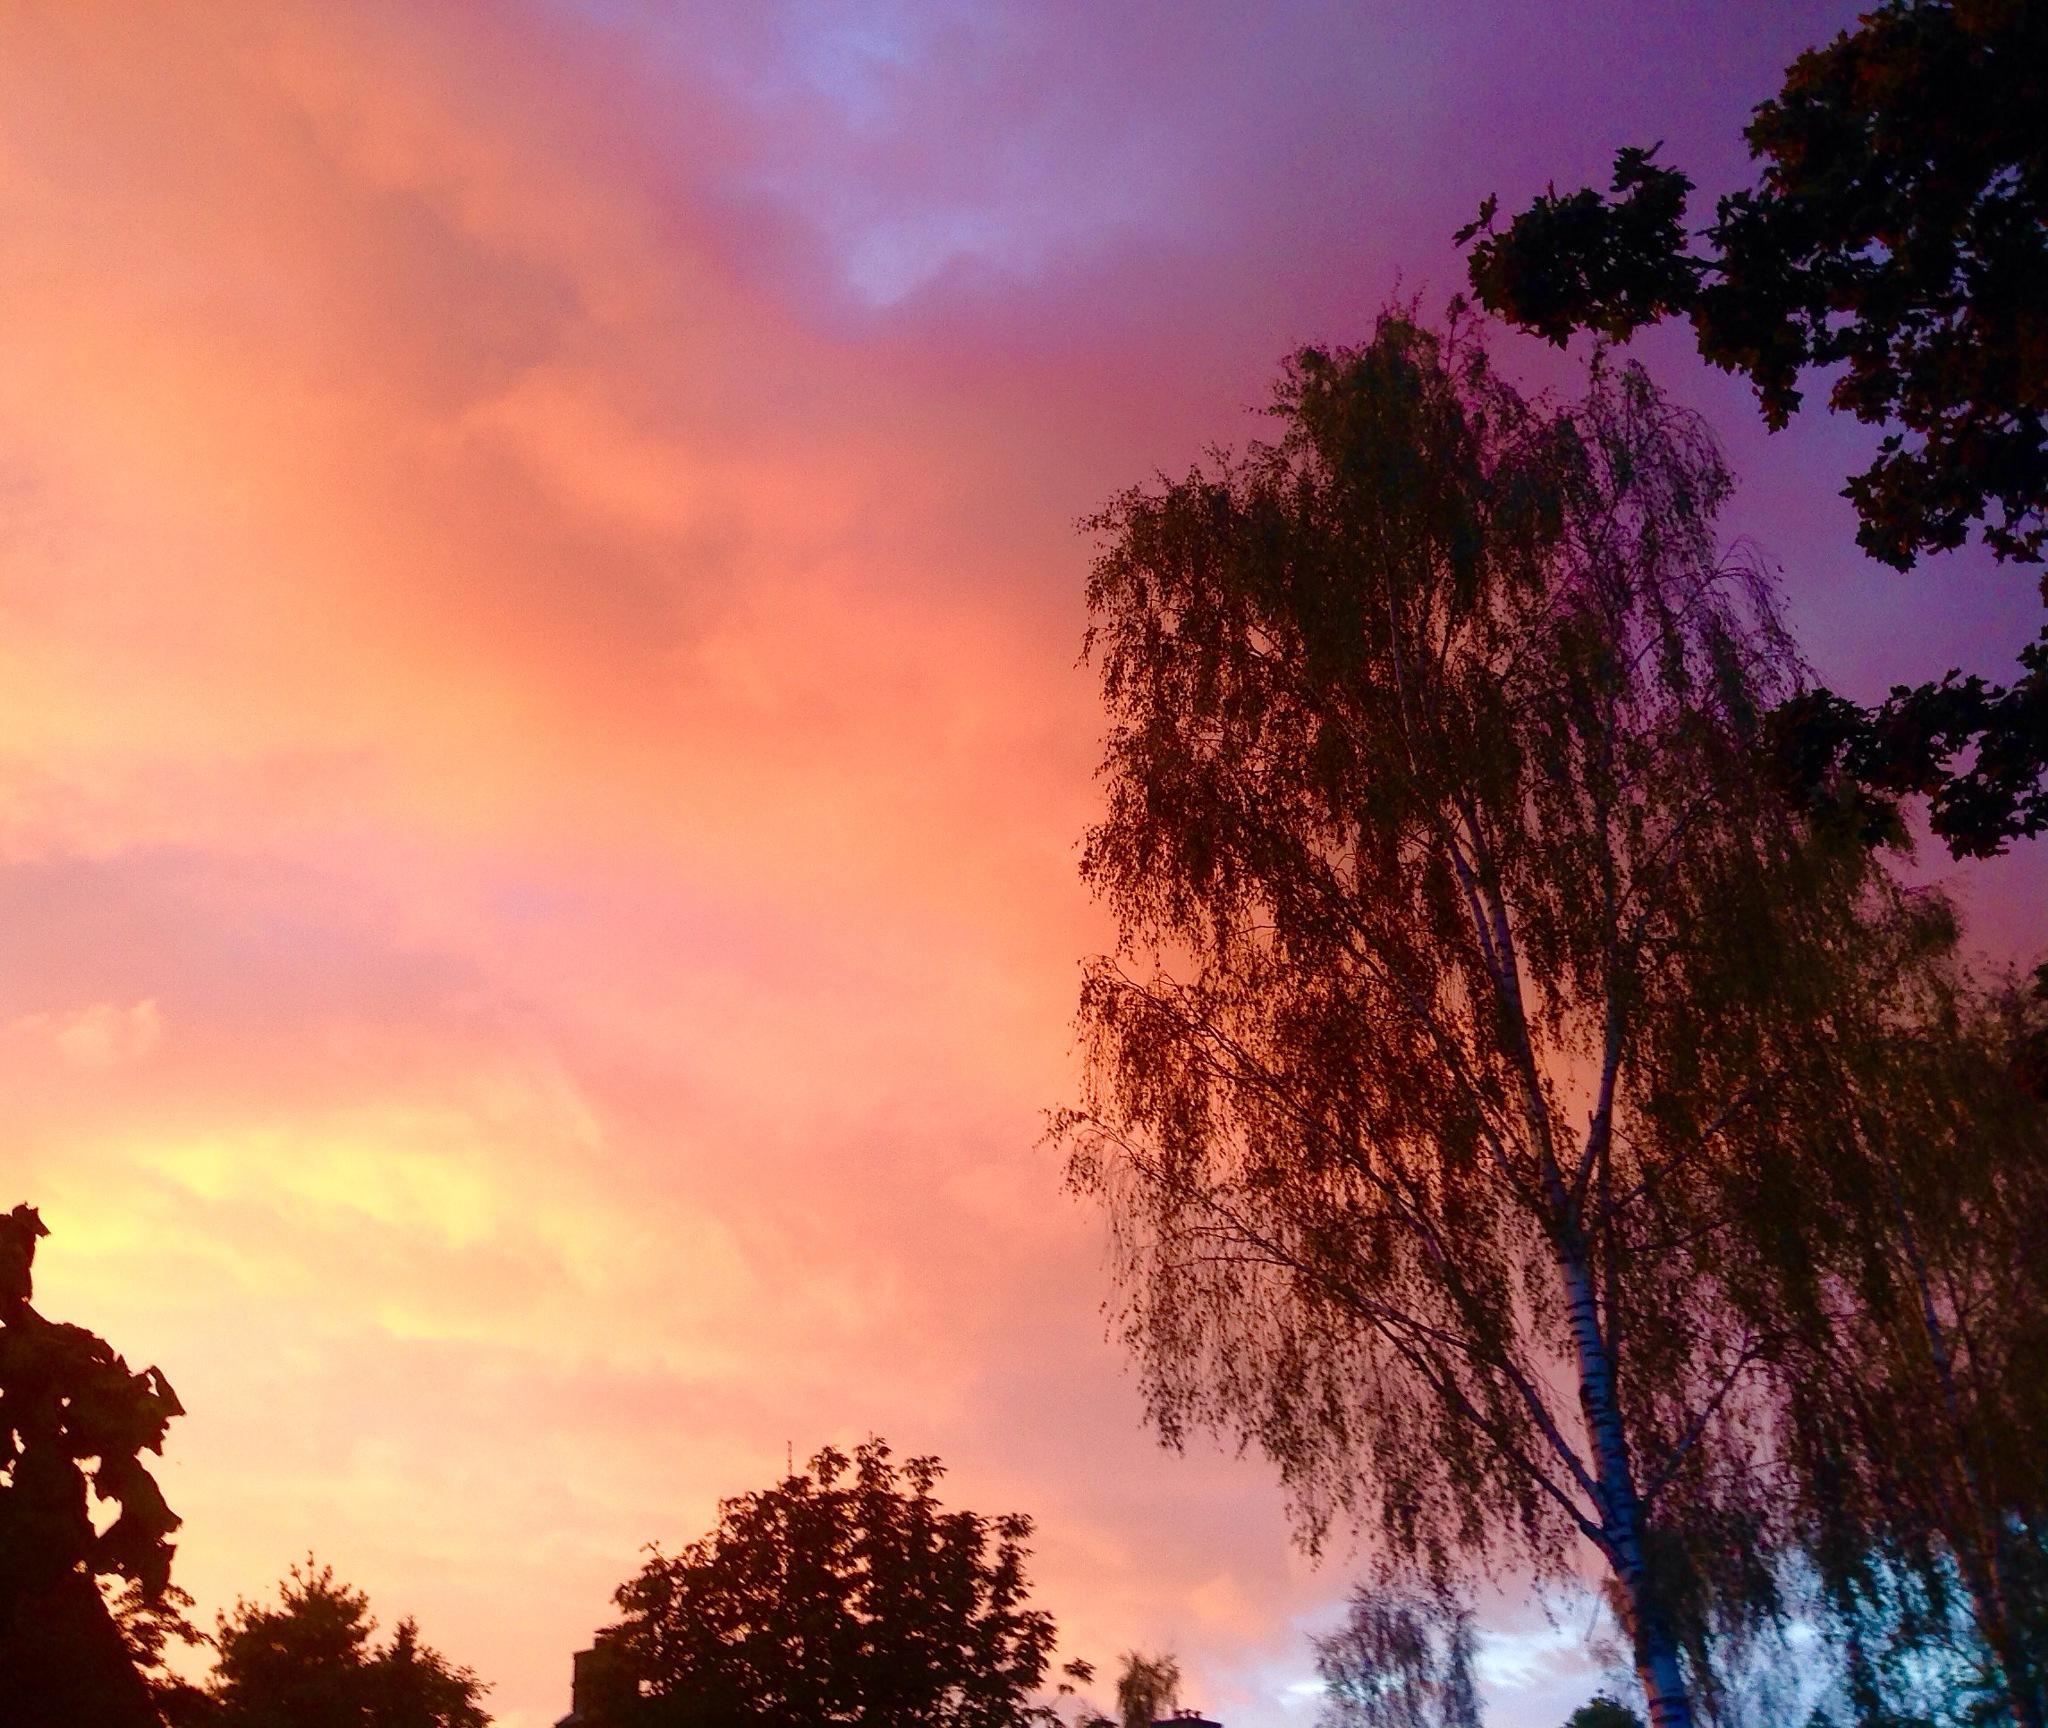 Sunset, Nice light in evening by Joop Bruurs